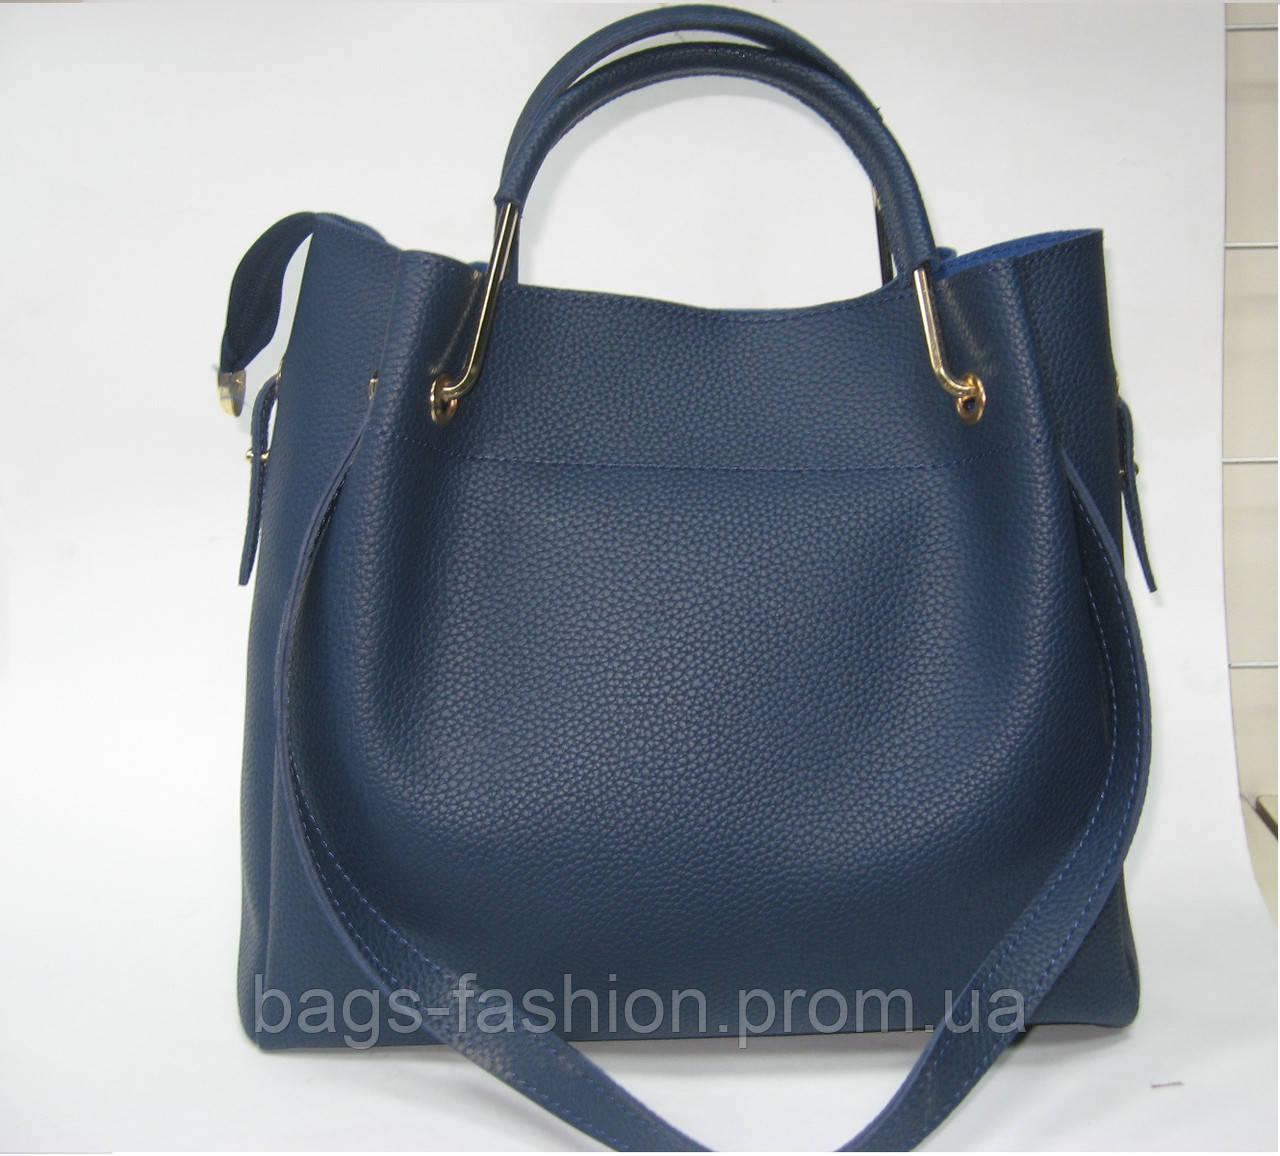 c4ccb1896a35 Стильная сумка Voila из экокожи, цена 690 грн., купить в Харькове — Prom.ua  (ID#658032708)